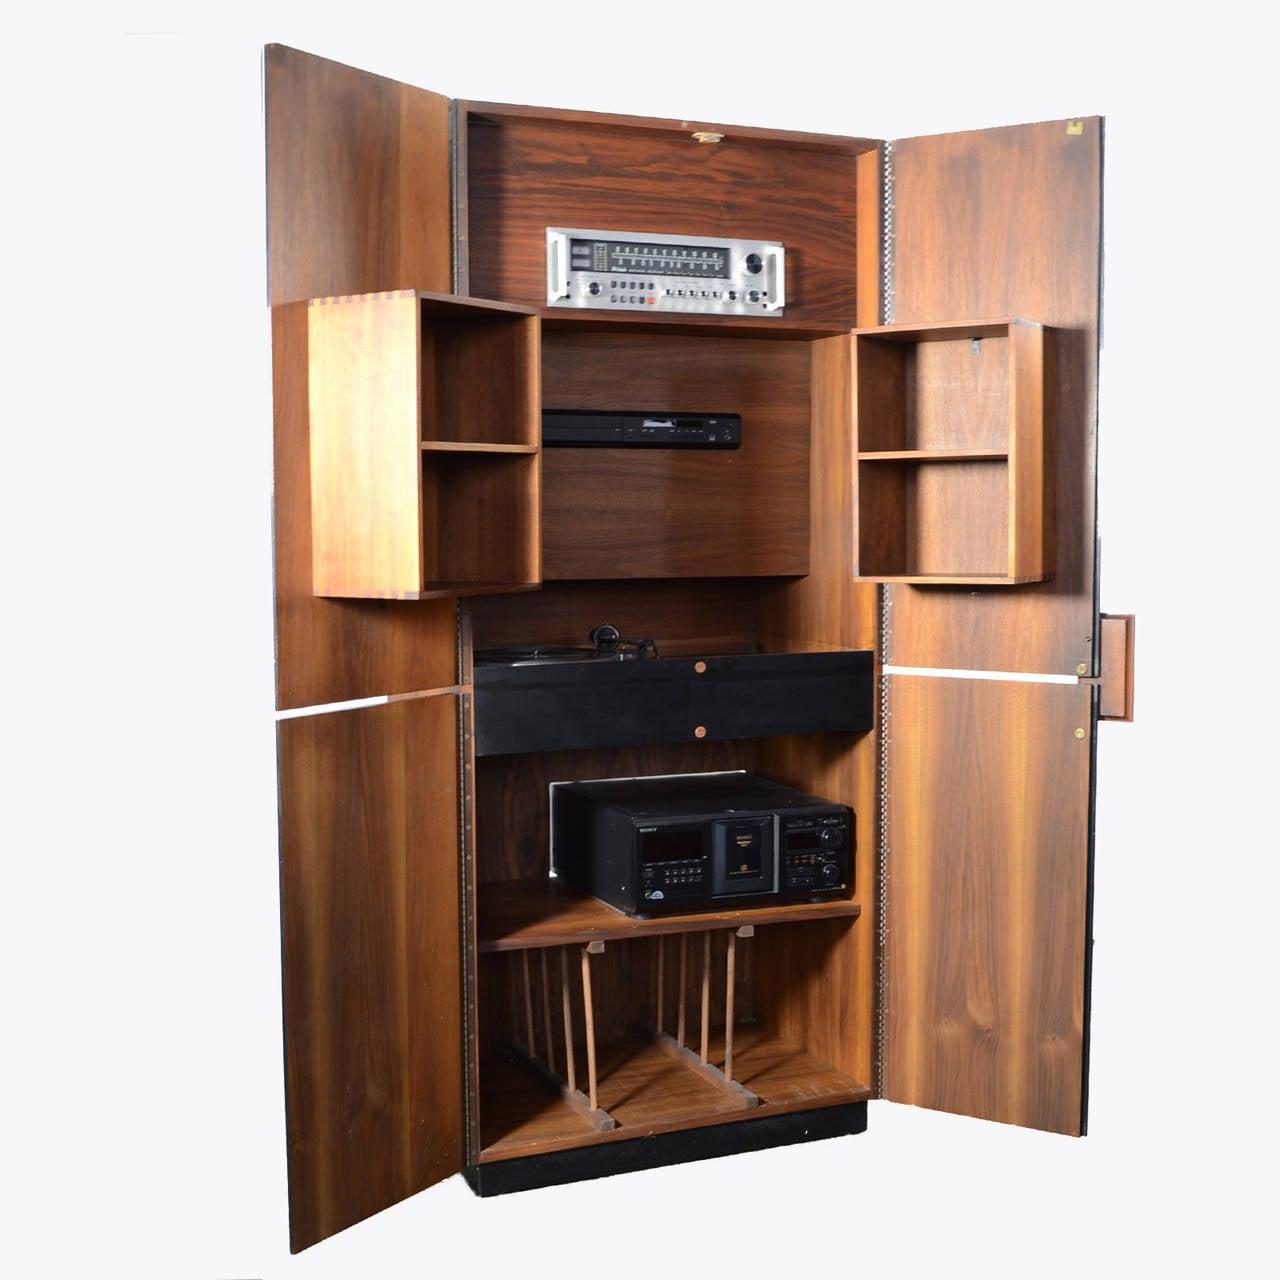 Richard Thompson Stereo Cabinet or Bar by Glenn of